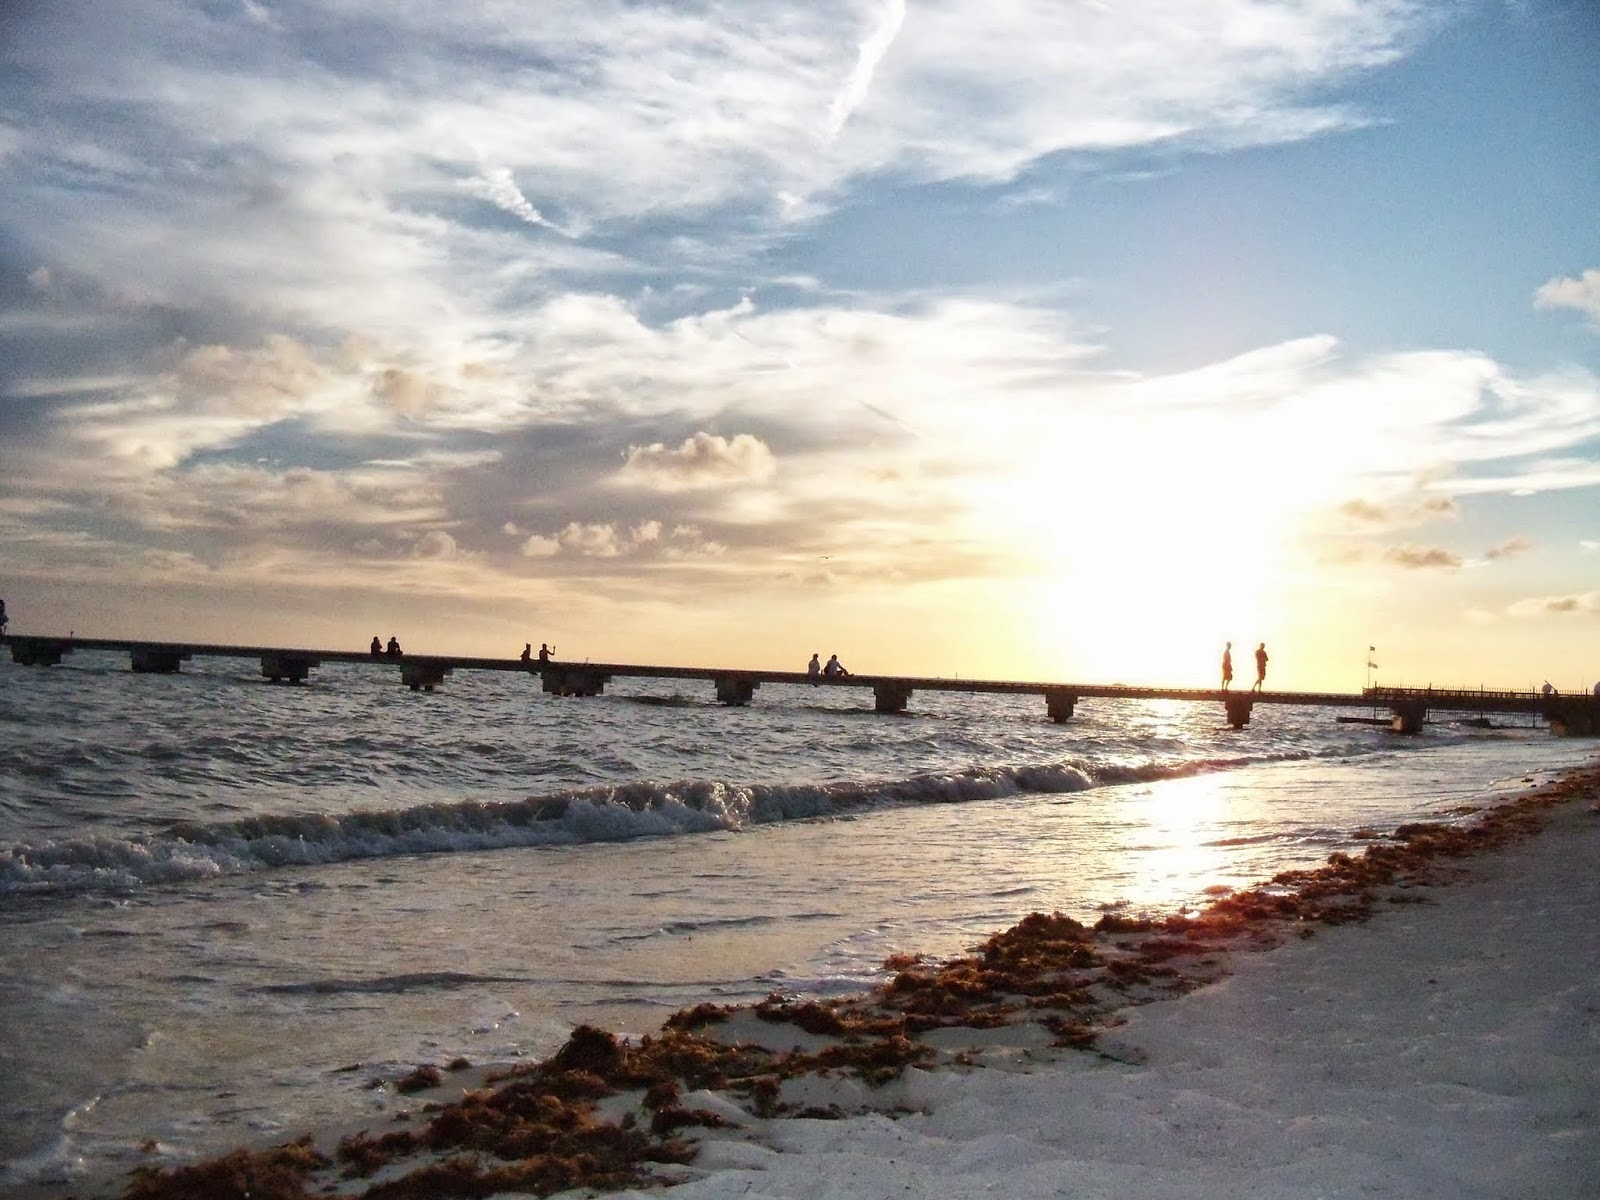 Key West Vacation - 116_5543.JPG